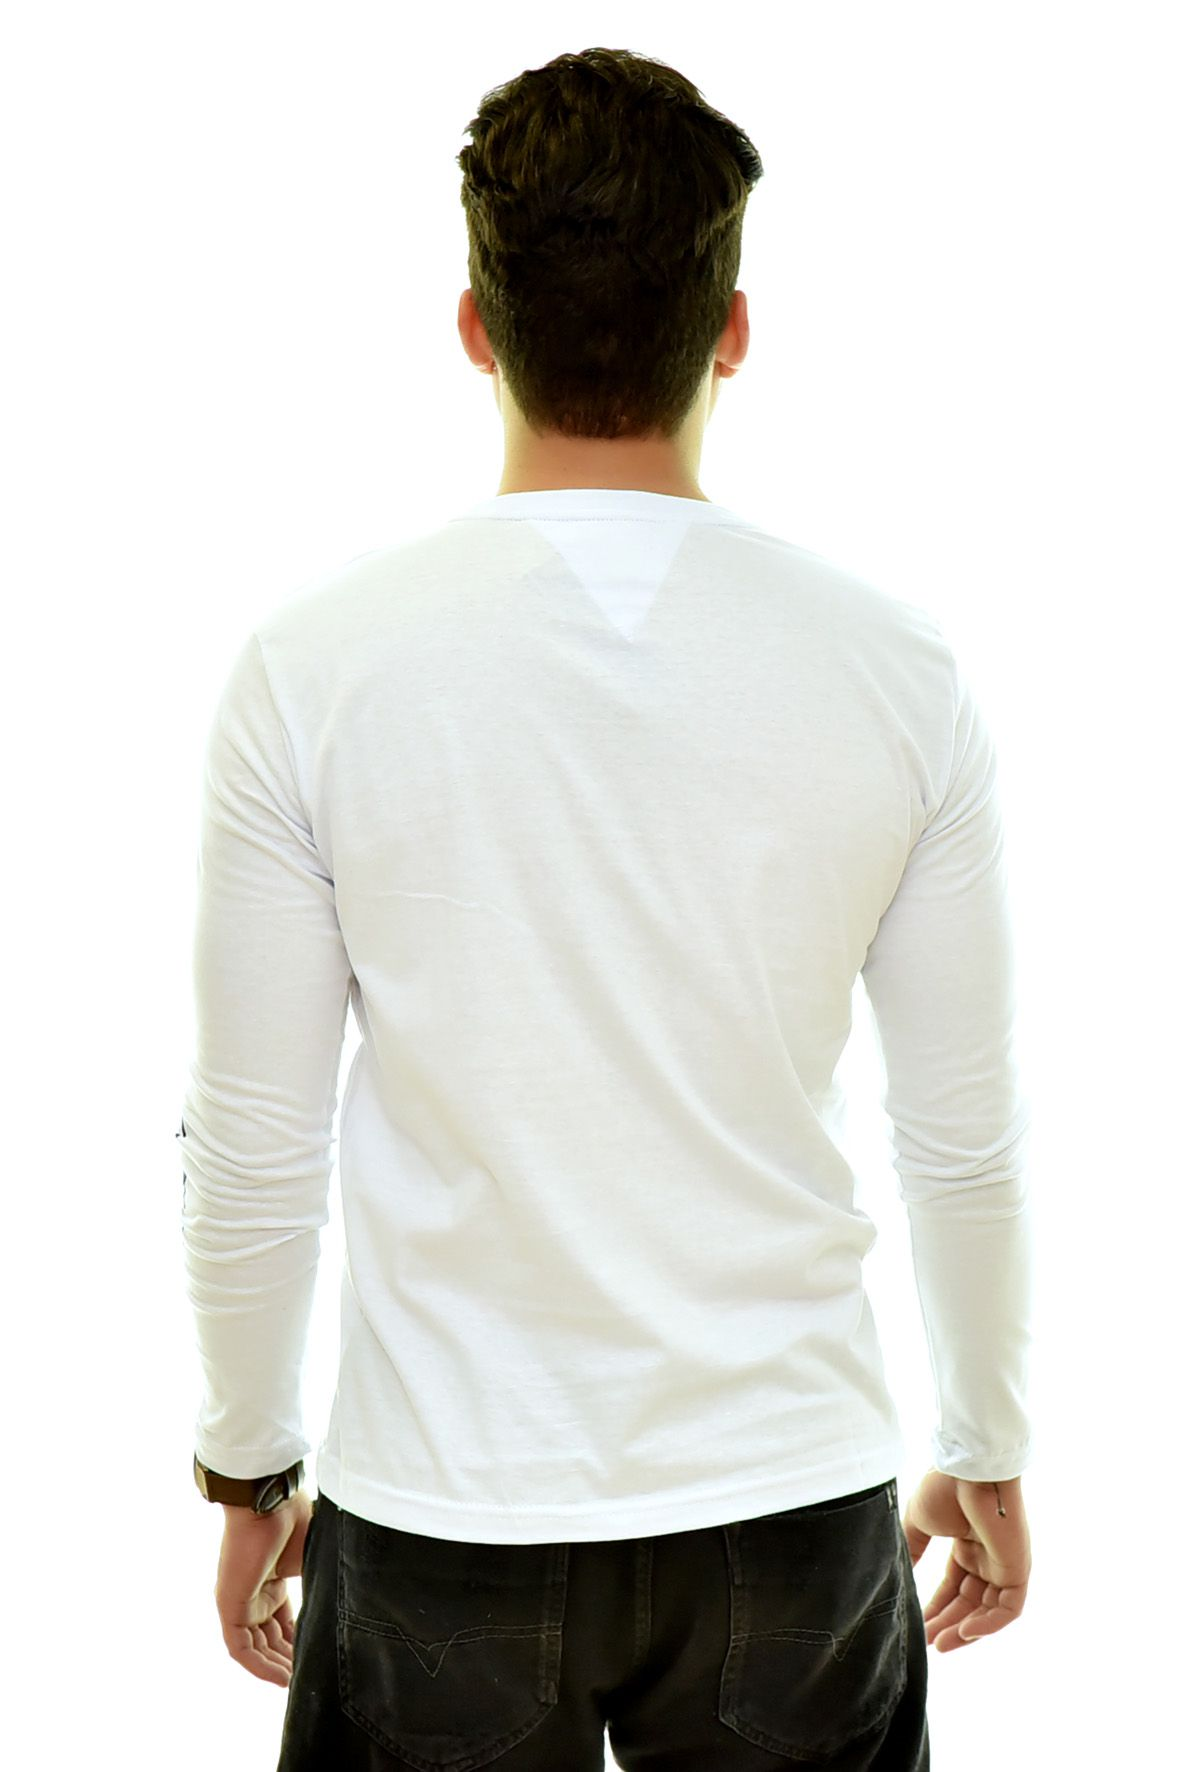 Camiseta TH Manga Longa Branca 04  - Ca Brasileira